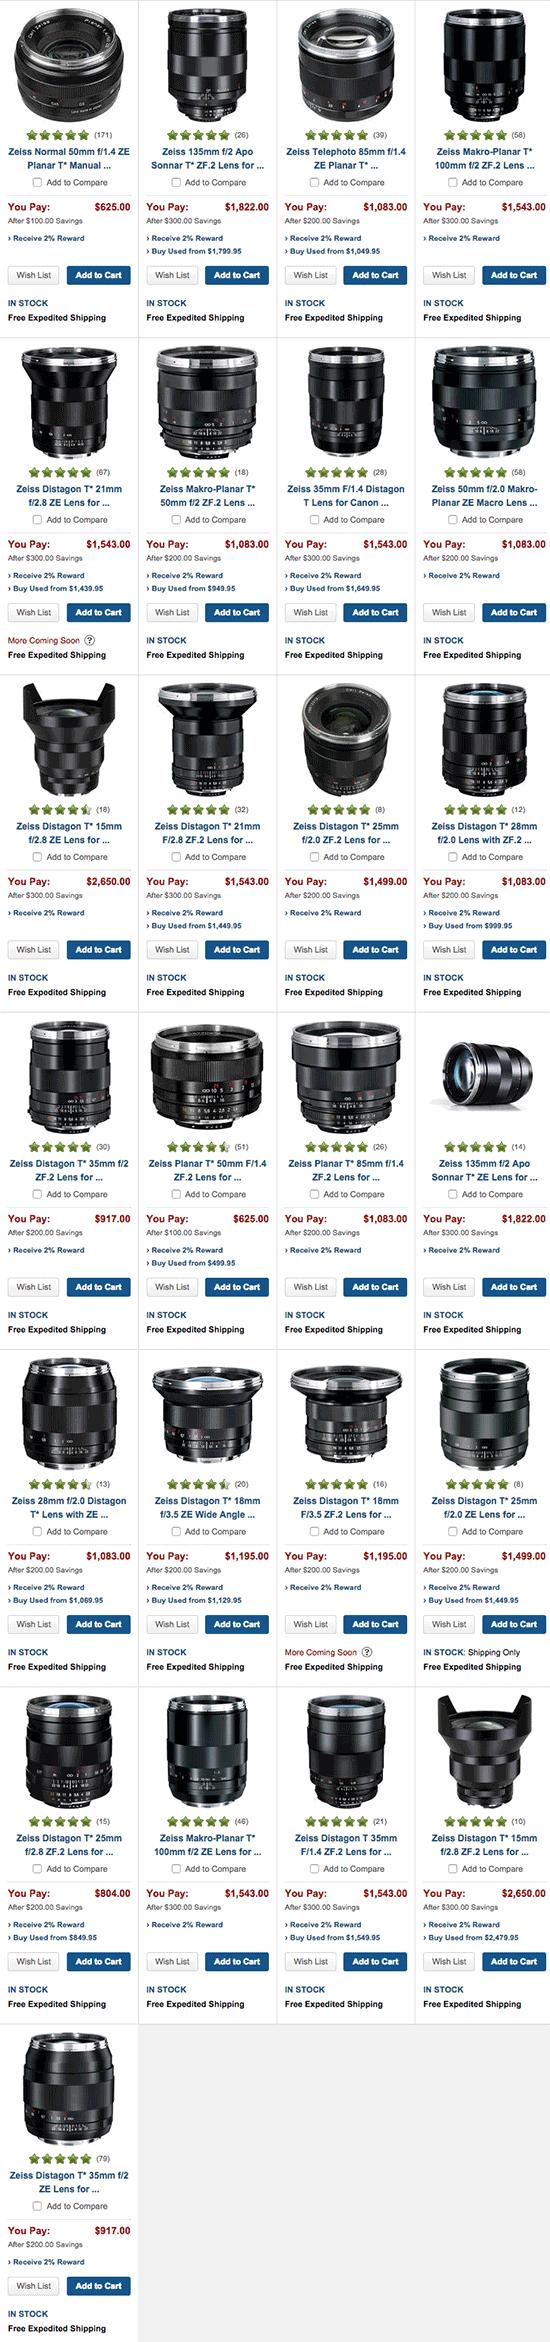 Zeis-lens-instant-savings